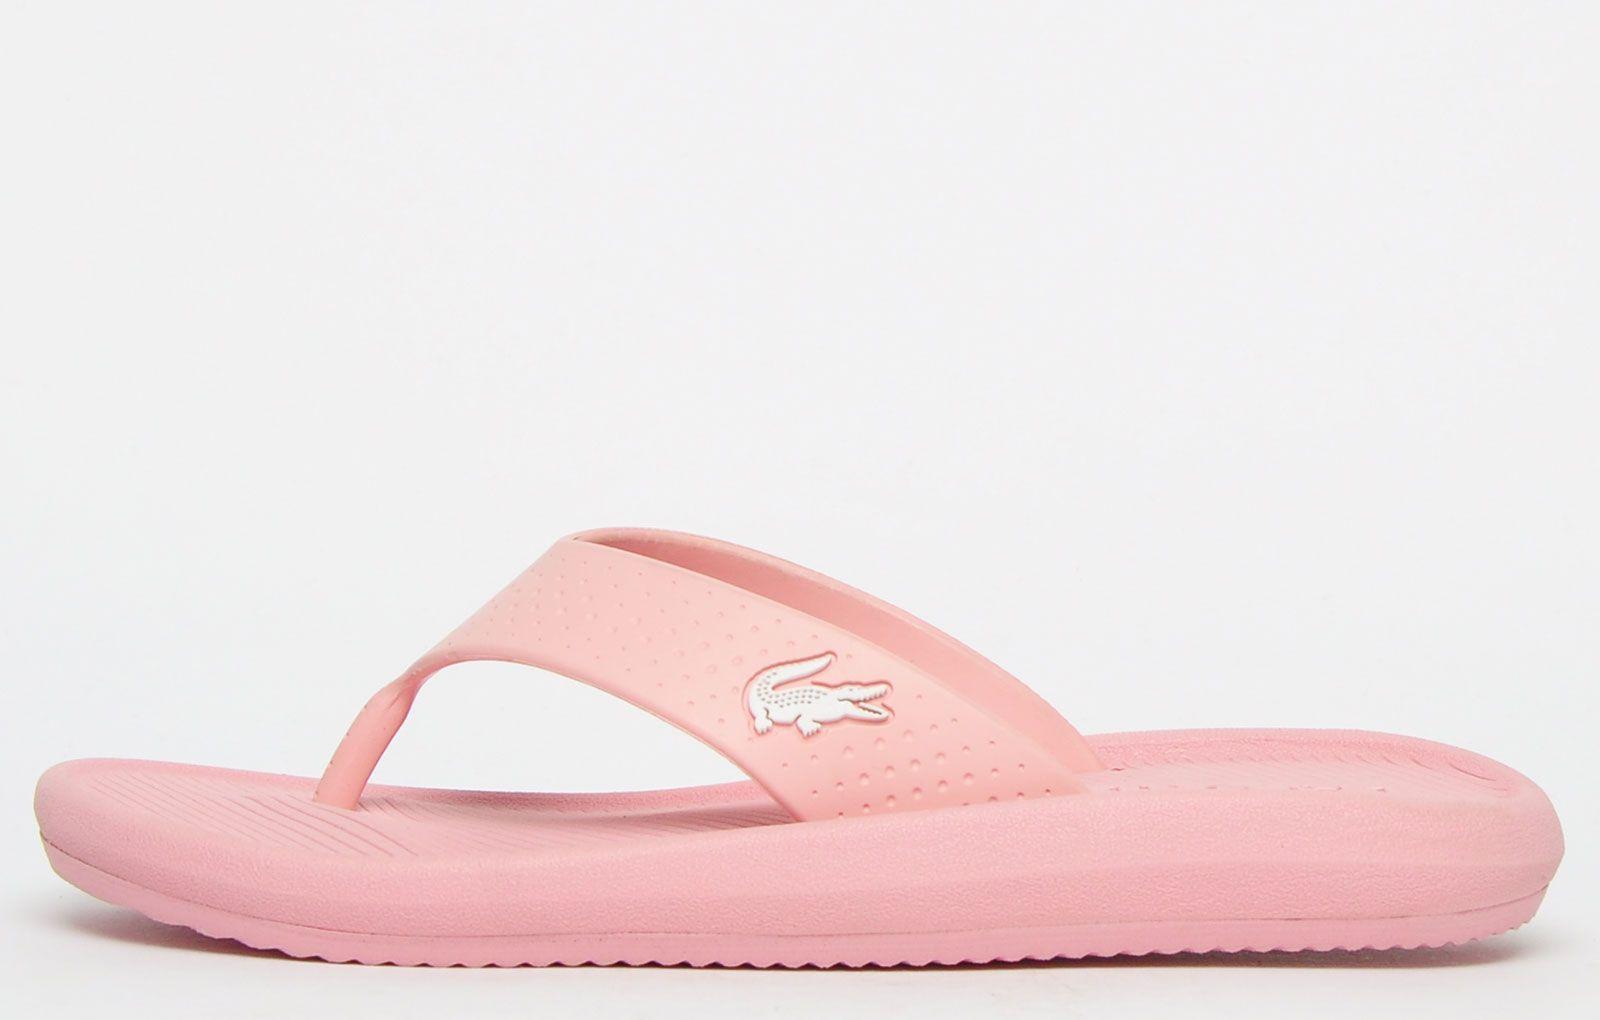 Lacoste Croco Sandal 219 Womens